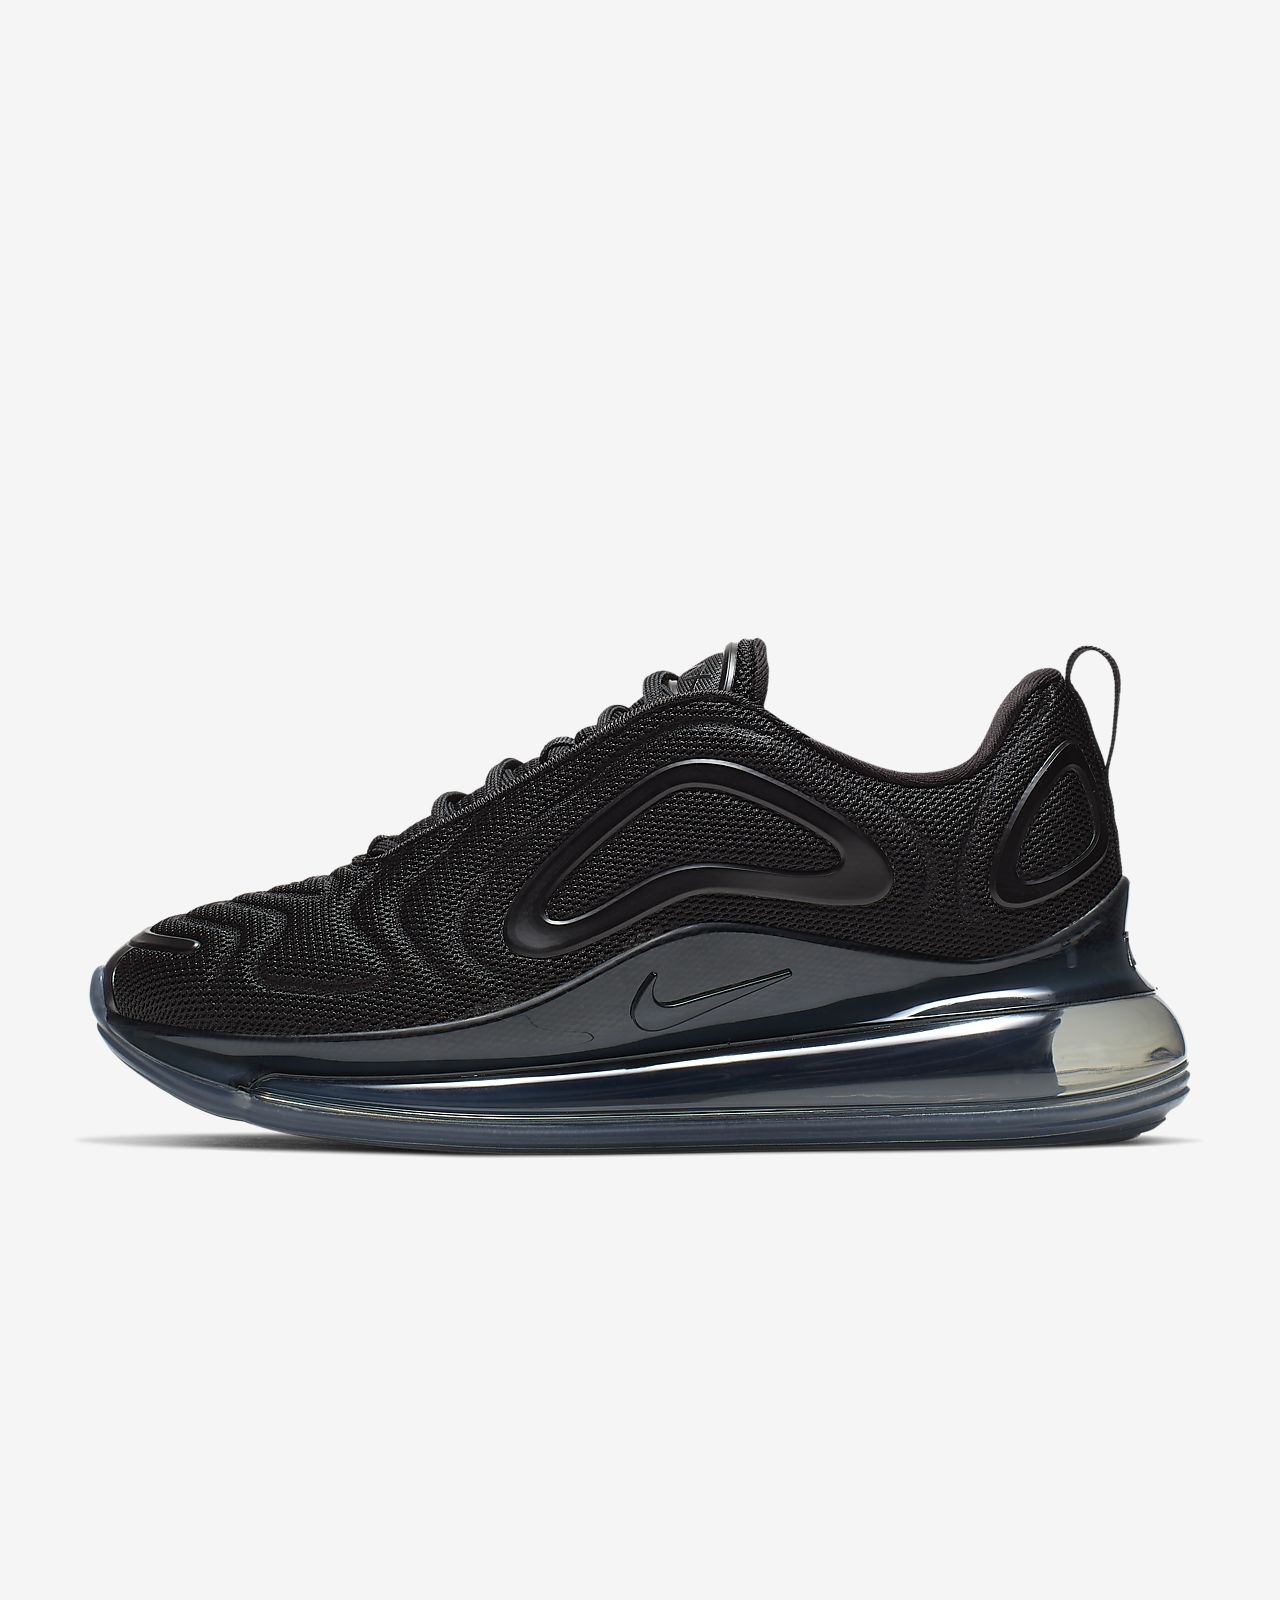 2nike max scarpe